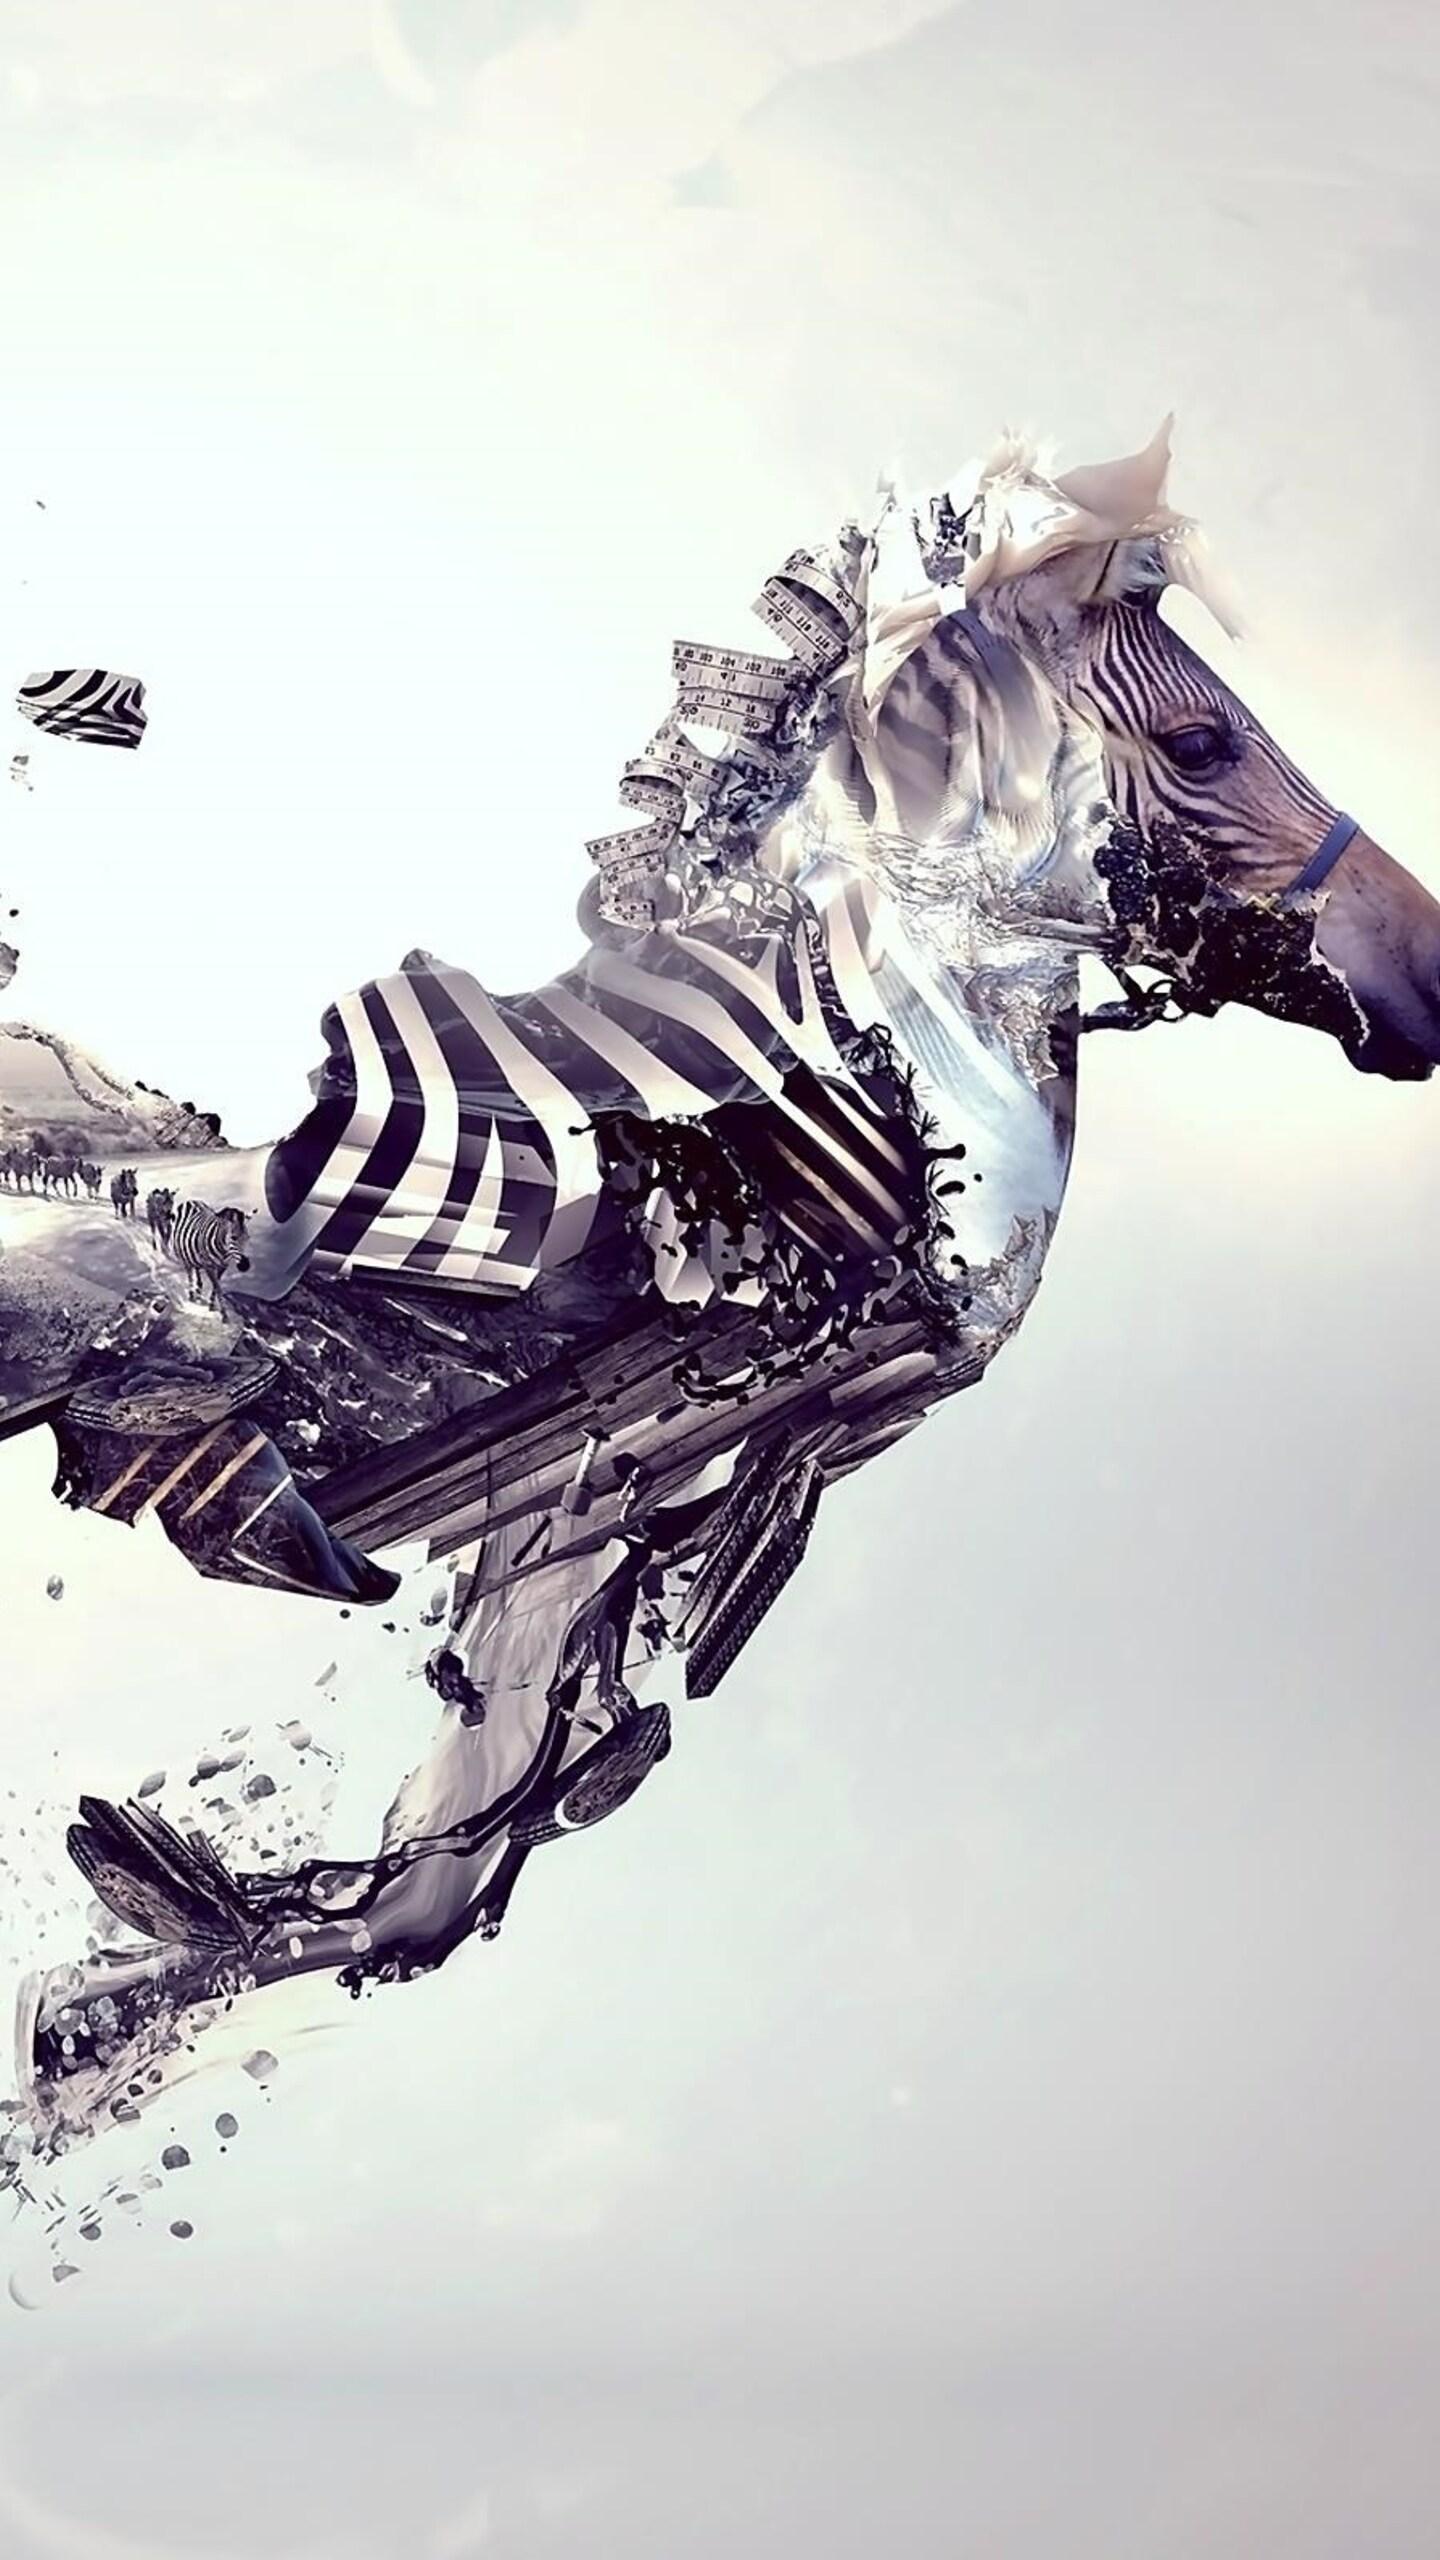 zebra-abstract-art.jpg